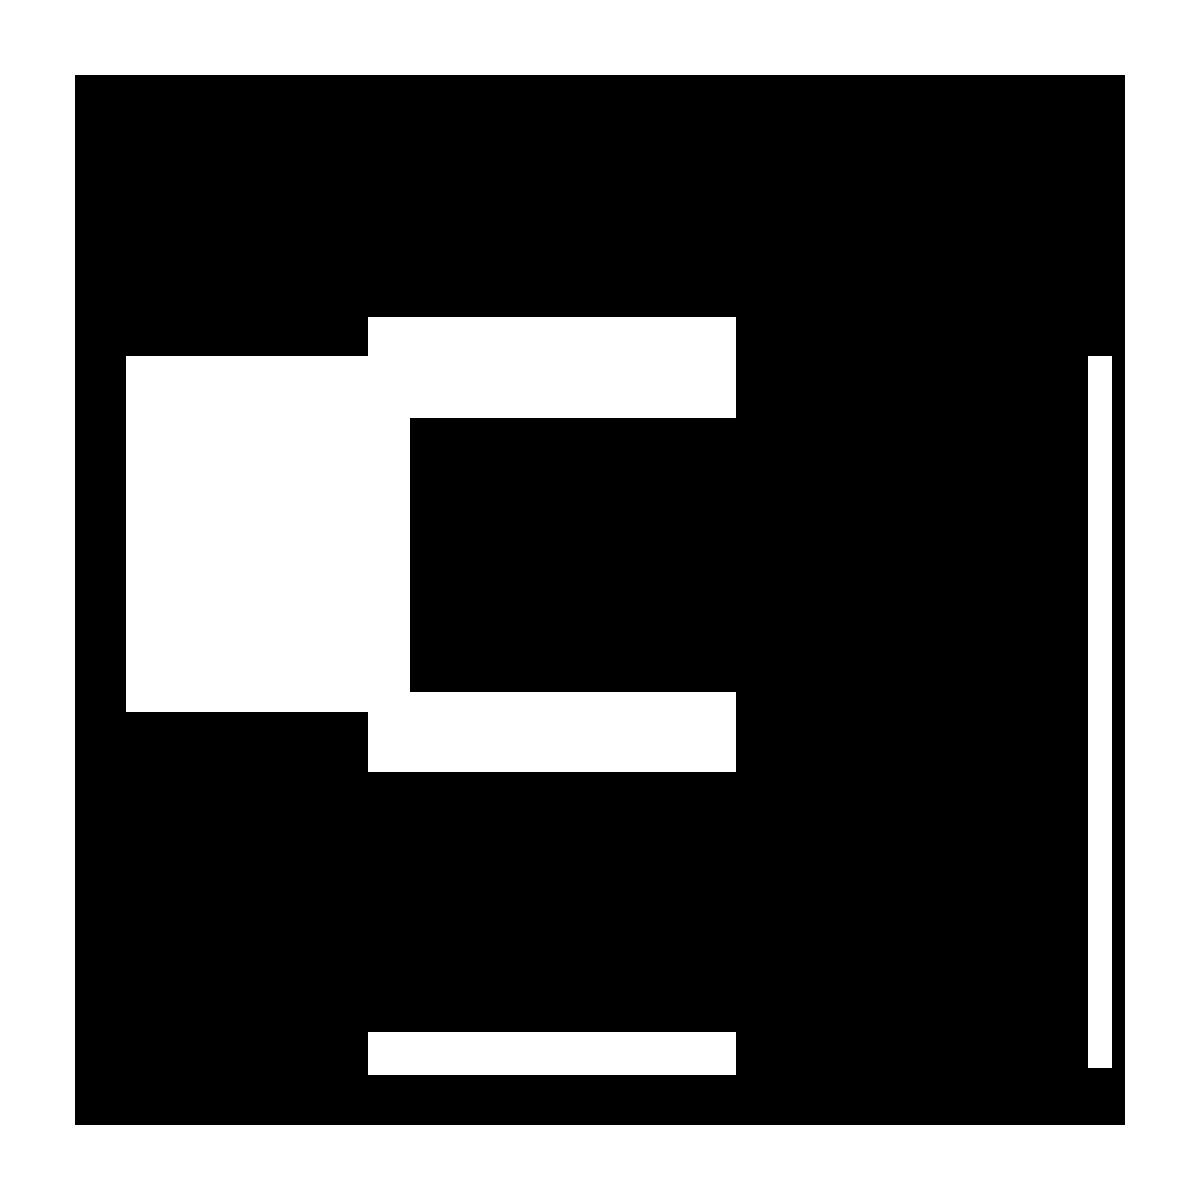 Arsenic Detection